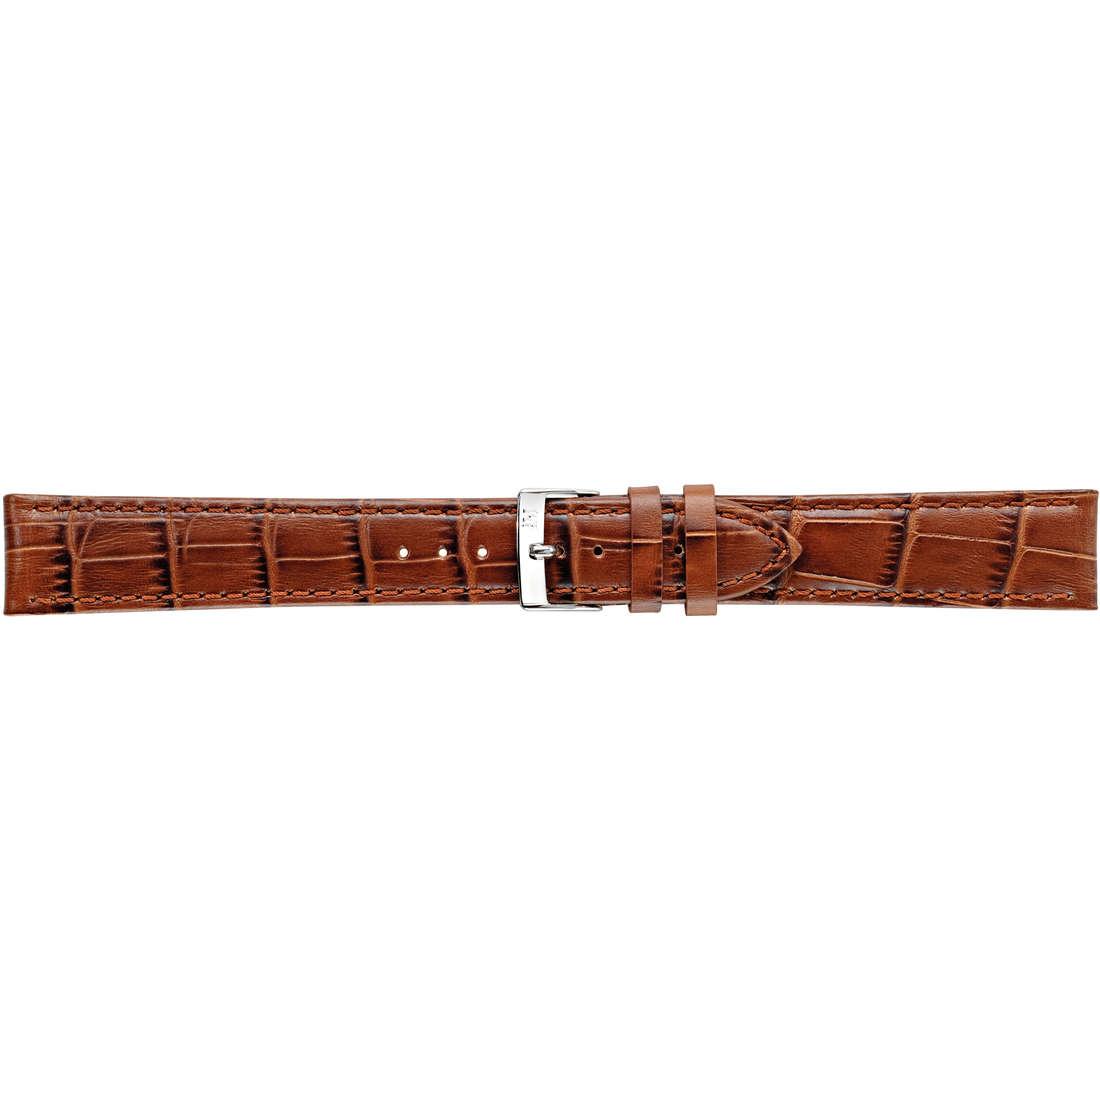 montre bande de montres unisex Morellato I Lunghi A01Y2269480041CR18